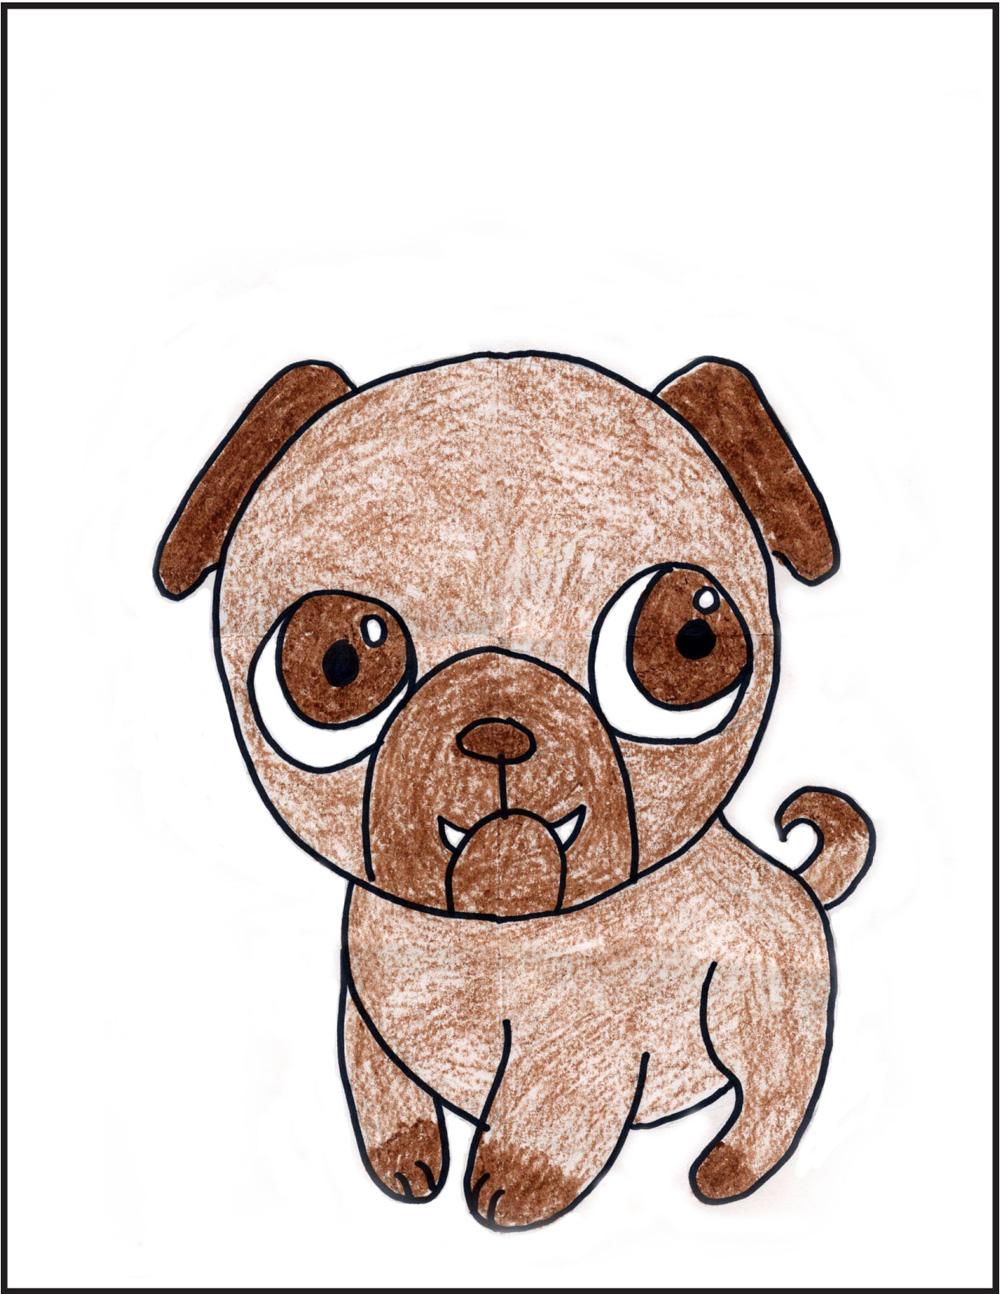 Drawn pug Realistic Pencil Pug Cartoon A